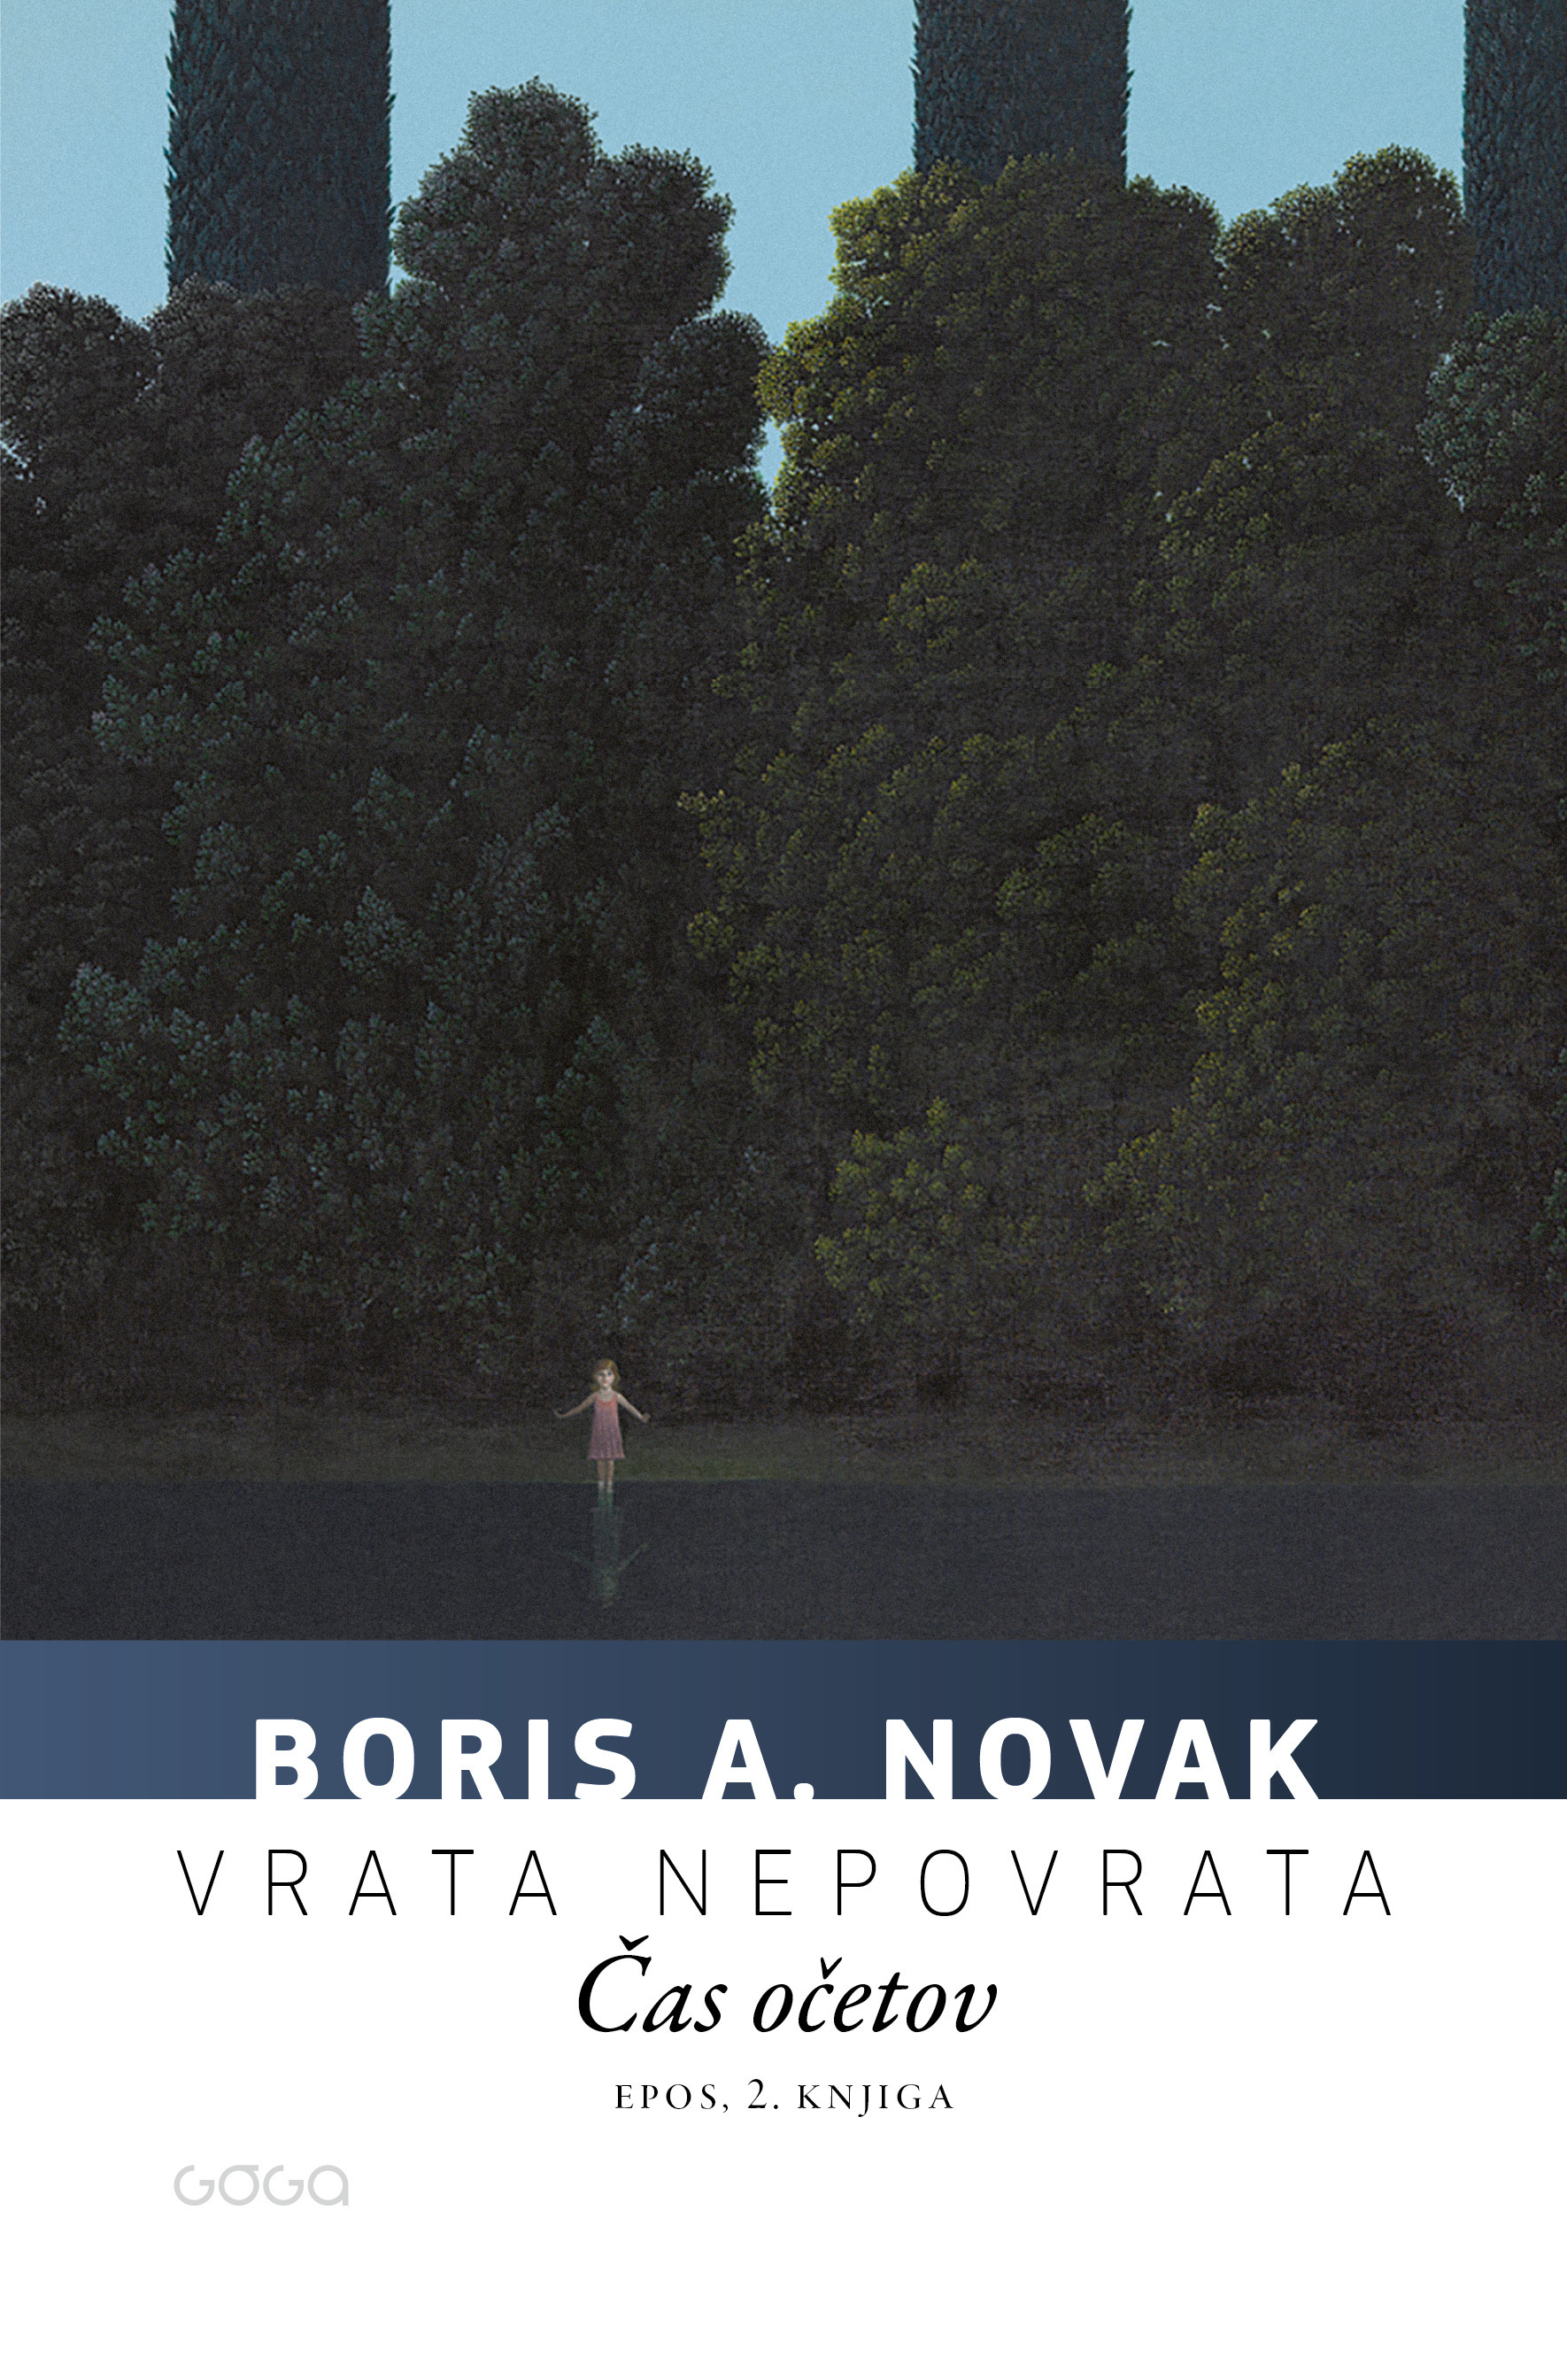 Vrata nepovrata, 2. knjiga: Cas ocetov